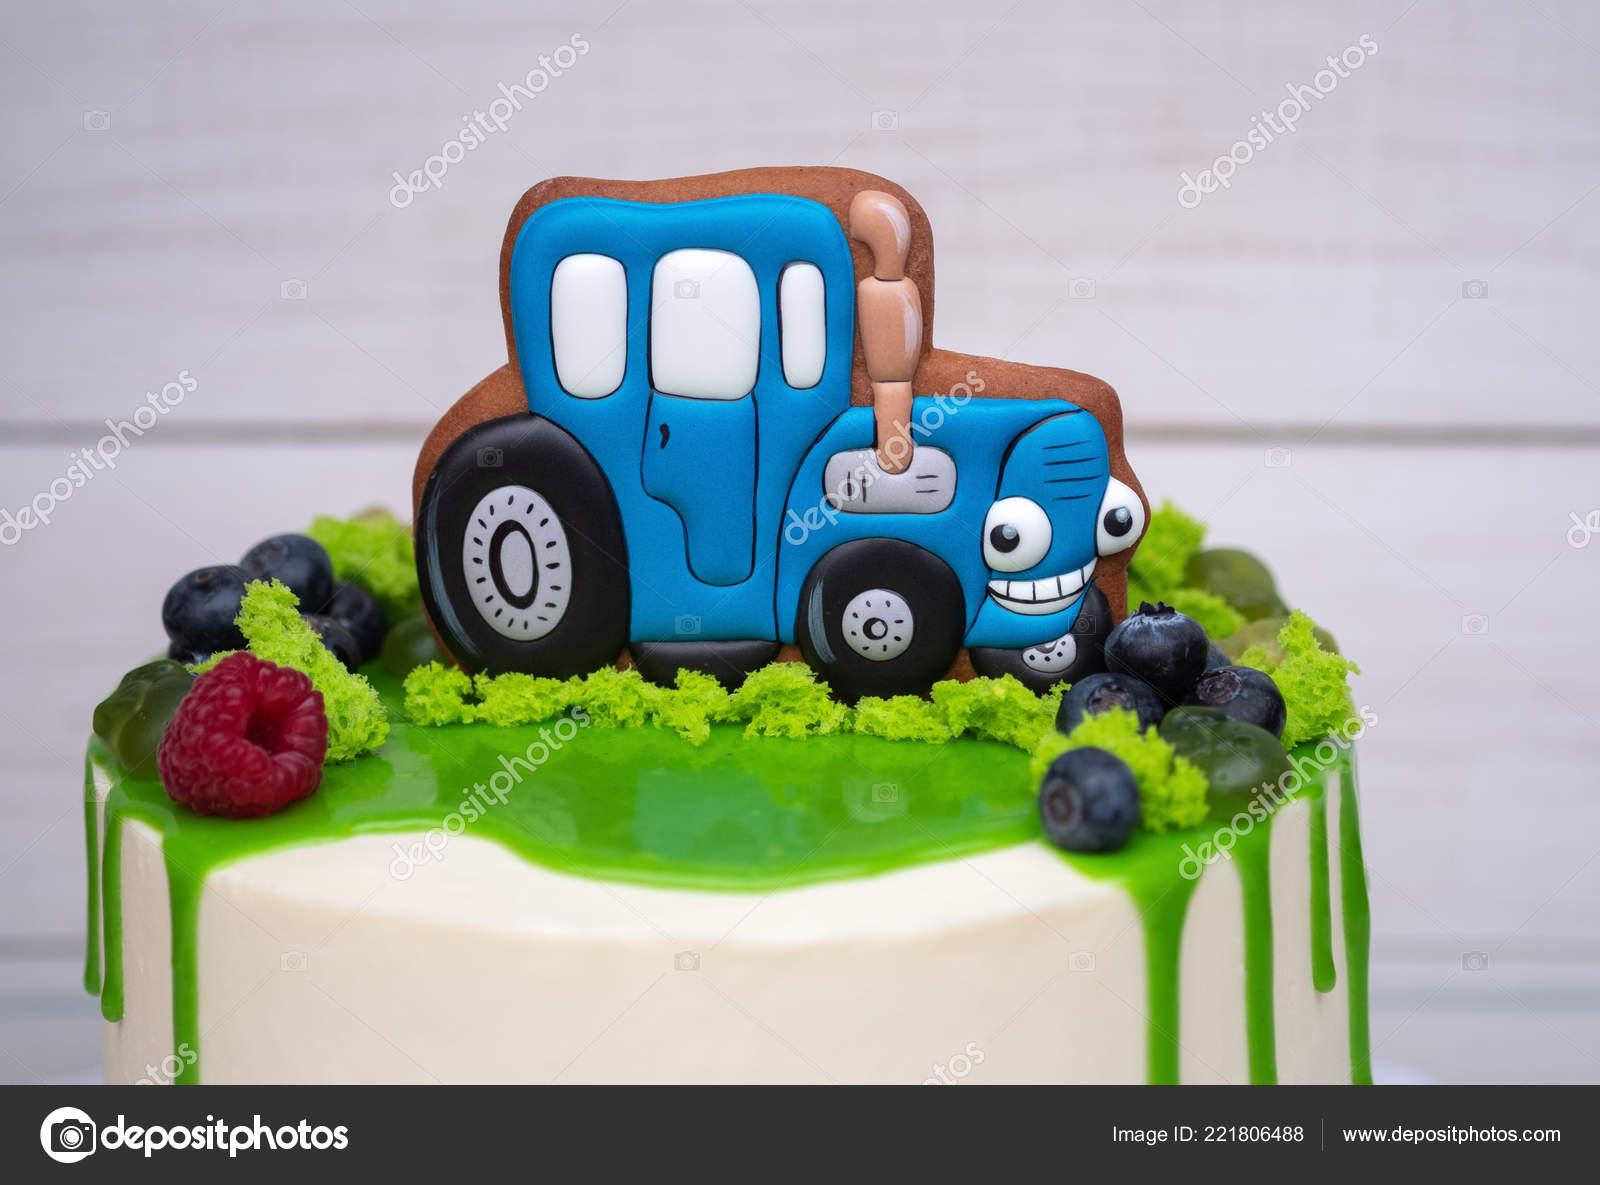 Pleasing Birthday Cake Child Toy Tractor Fresh Berries Stock Photo Personalised Birthday Cards Beptaeletsinfo